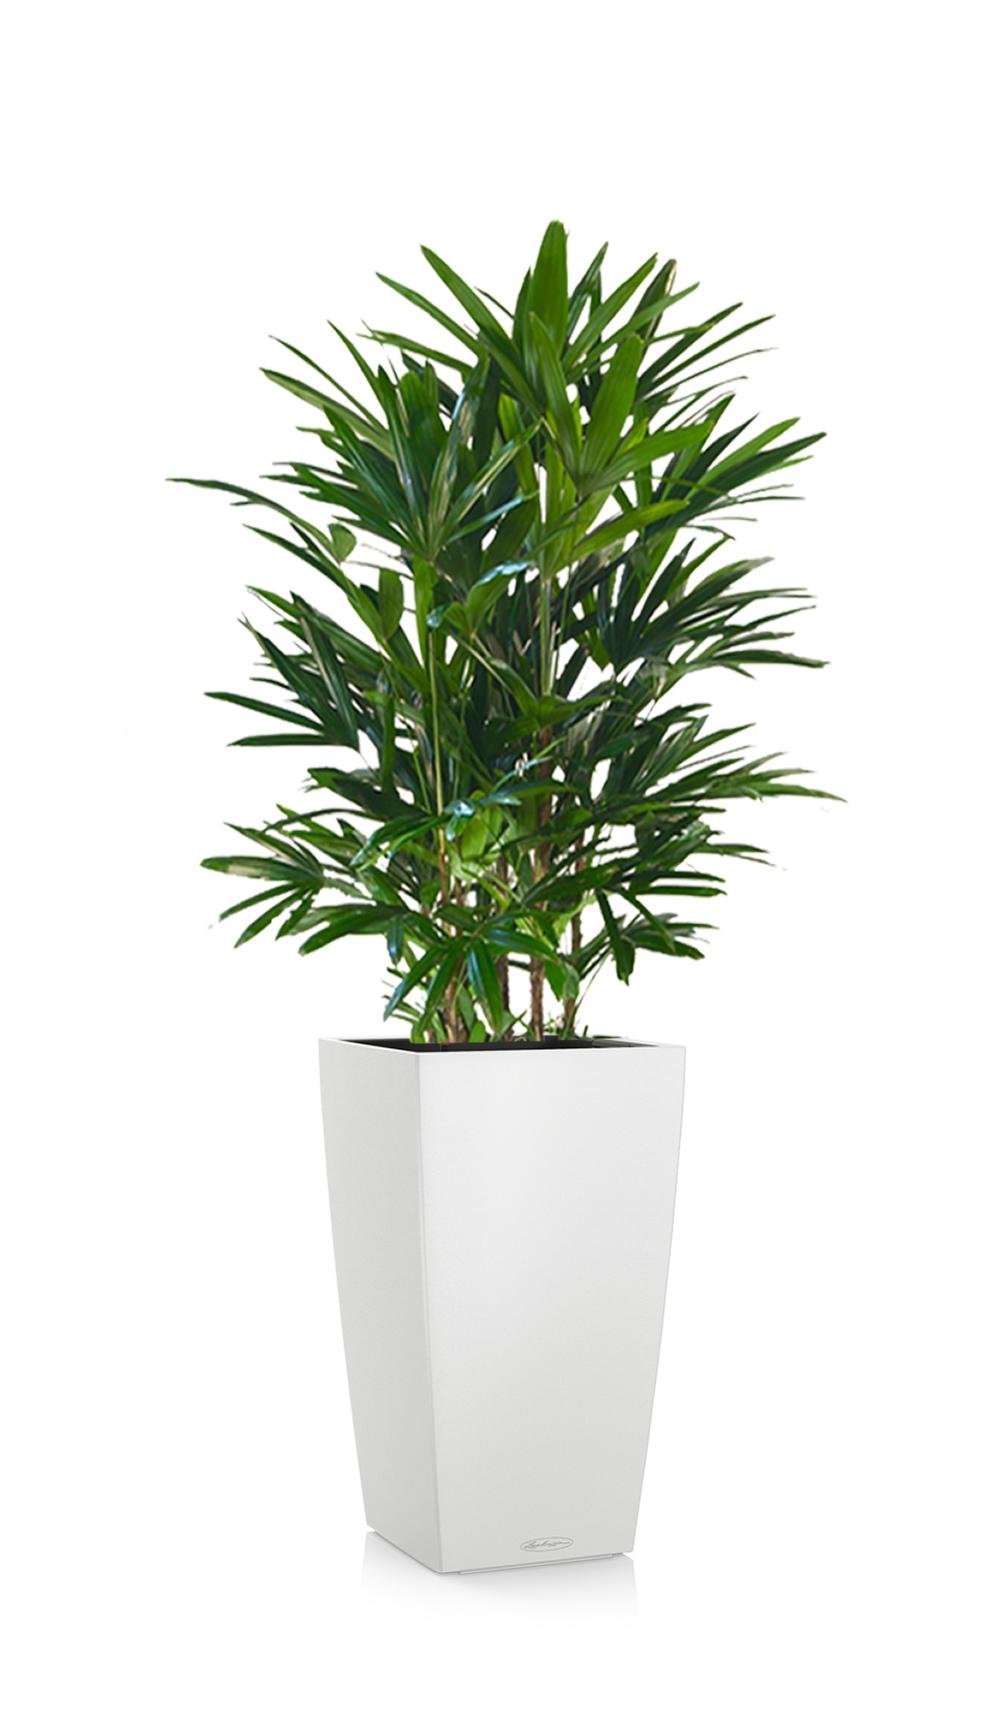 greenleaf_medhigh light_raphis palm